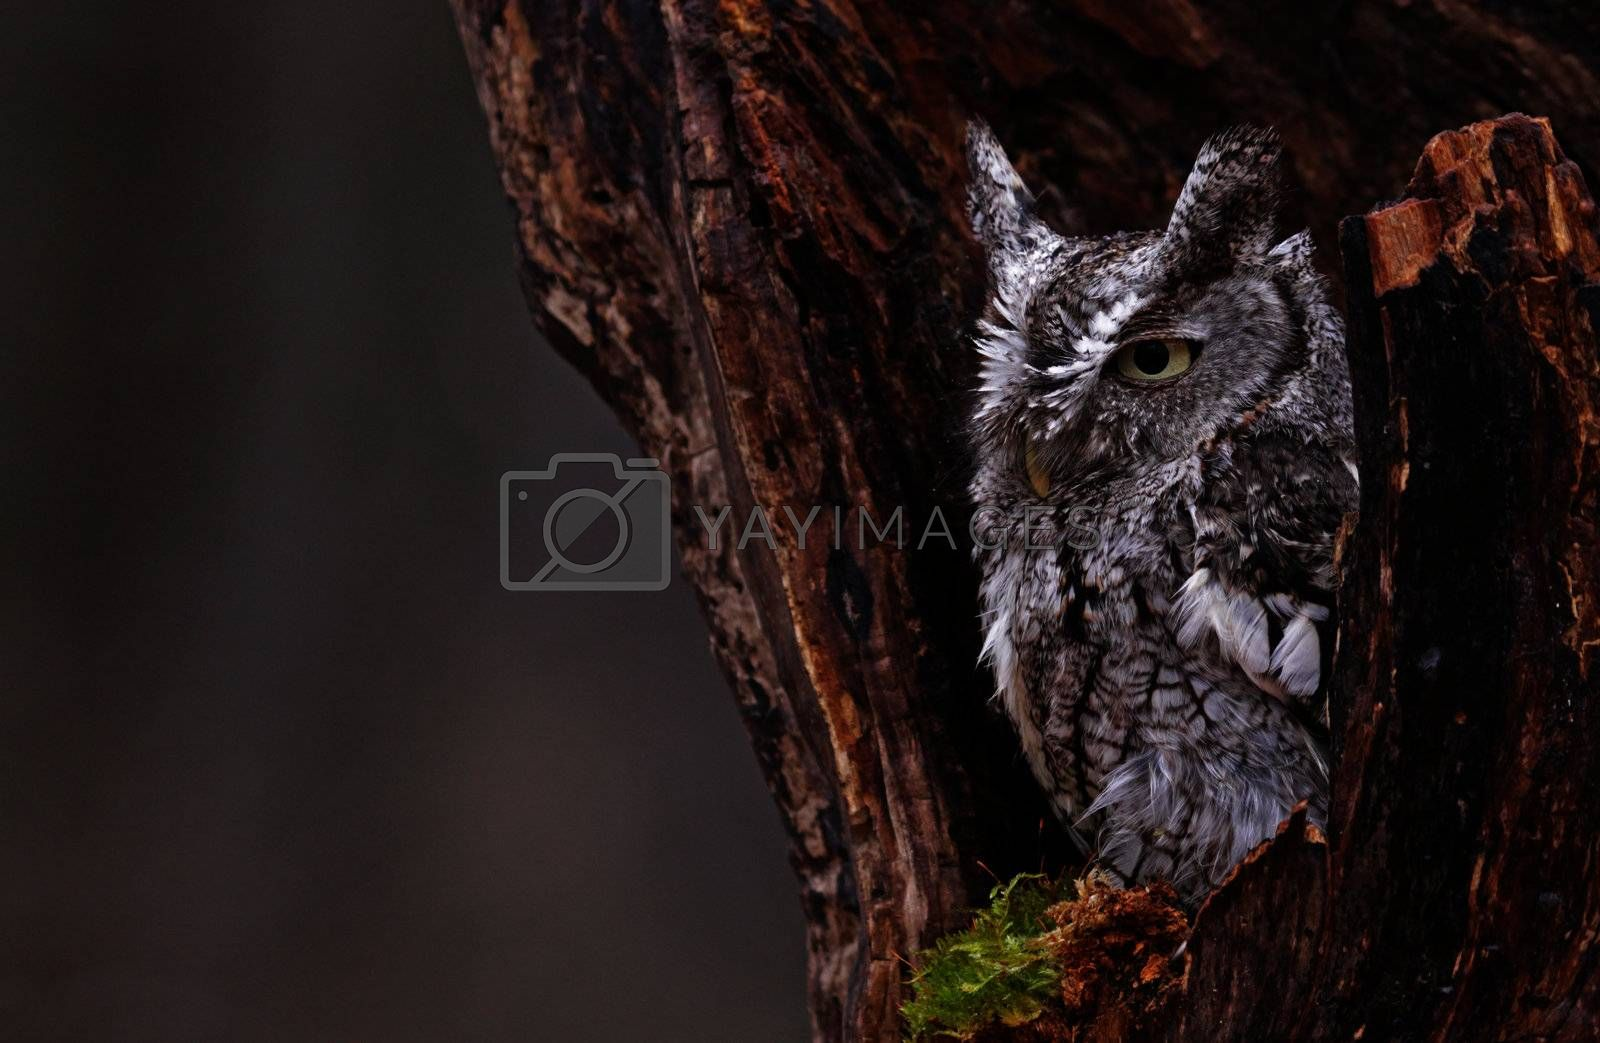 A close-up of an Eastern Screech Owl (Megascops asio) sitting in a stump.